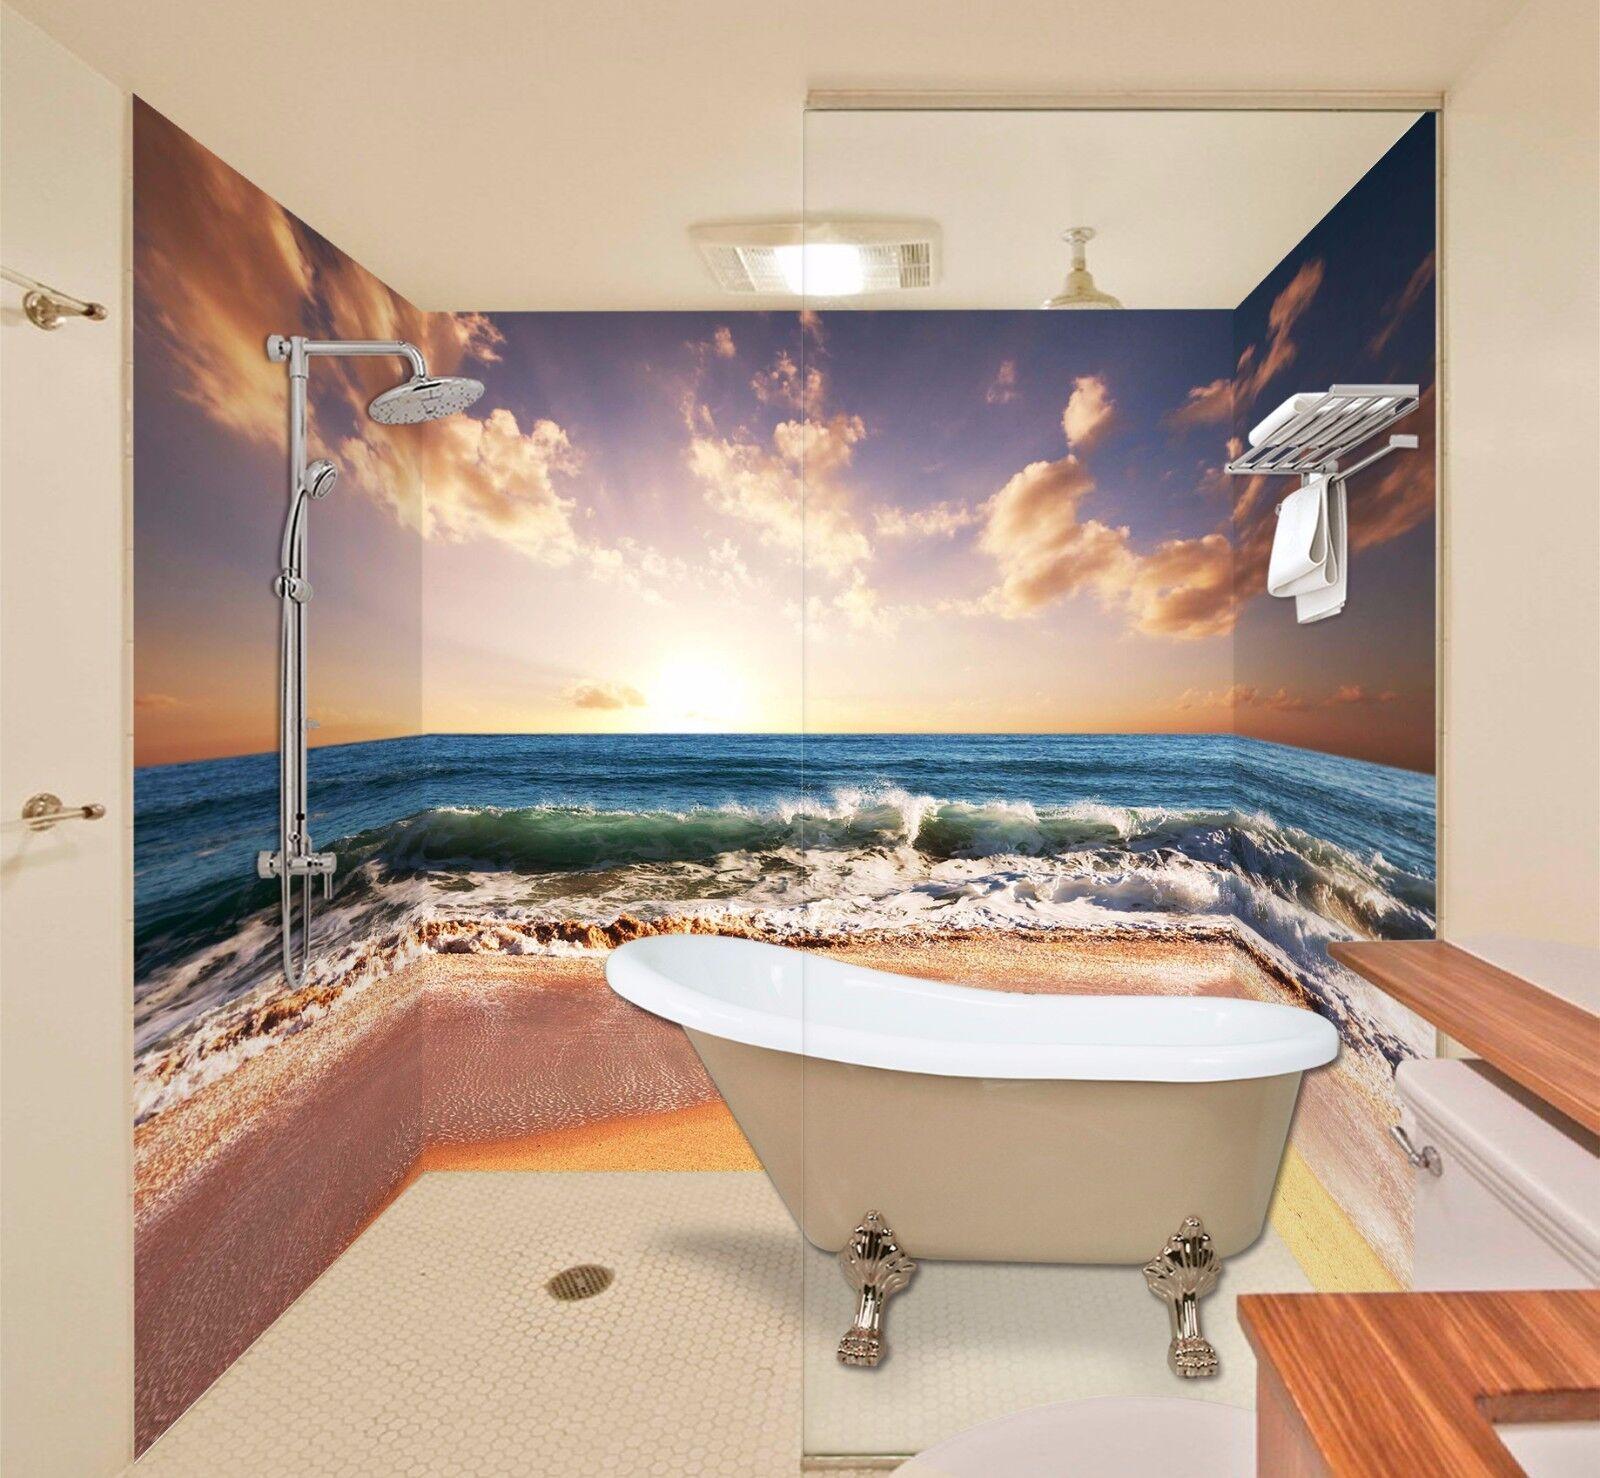 3D Seaside Scenery 43 WallPaper Bathroom Print Decal Wall Deco AJ WALLPAPER AU